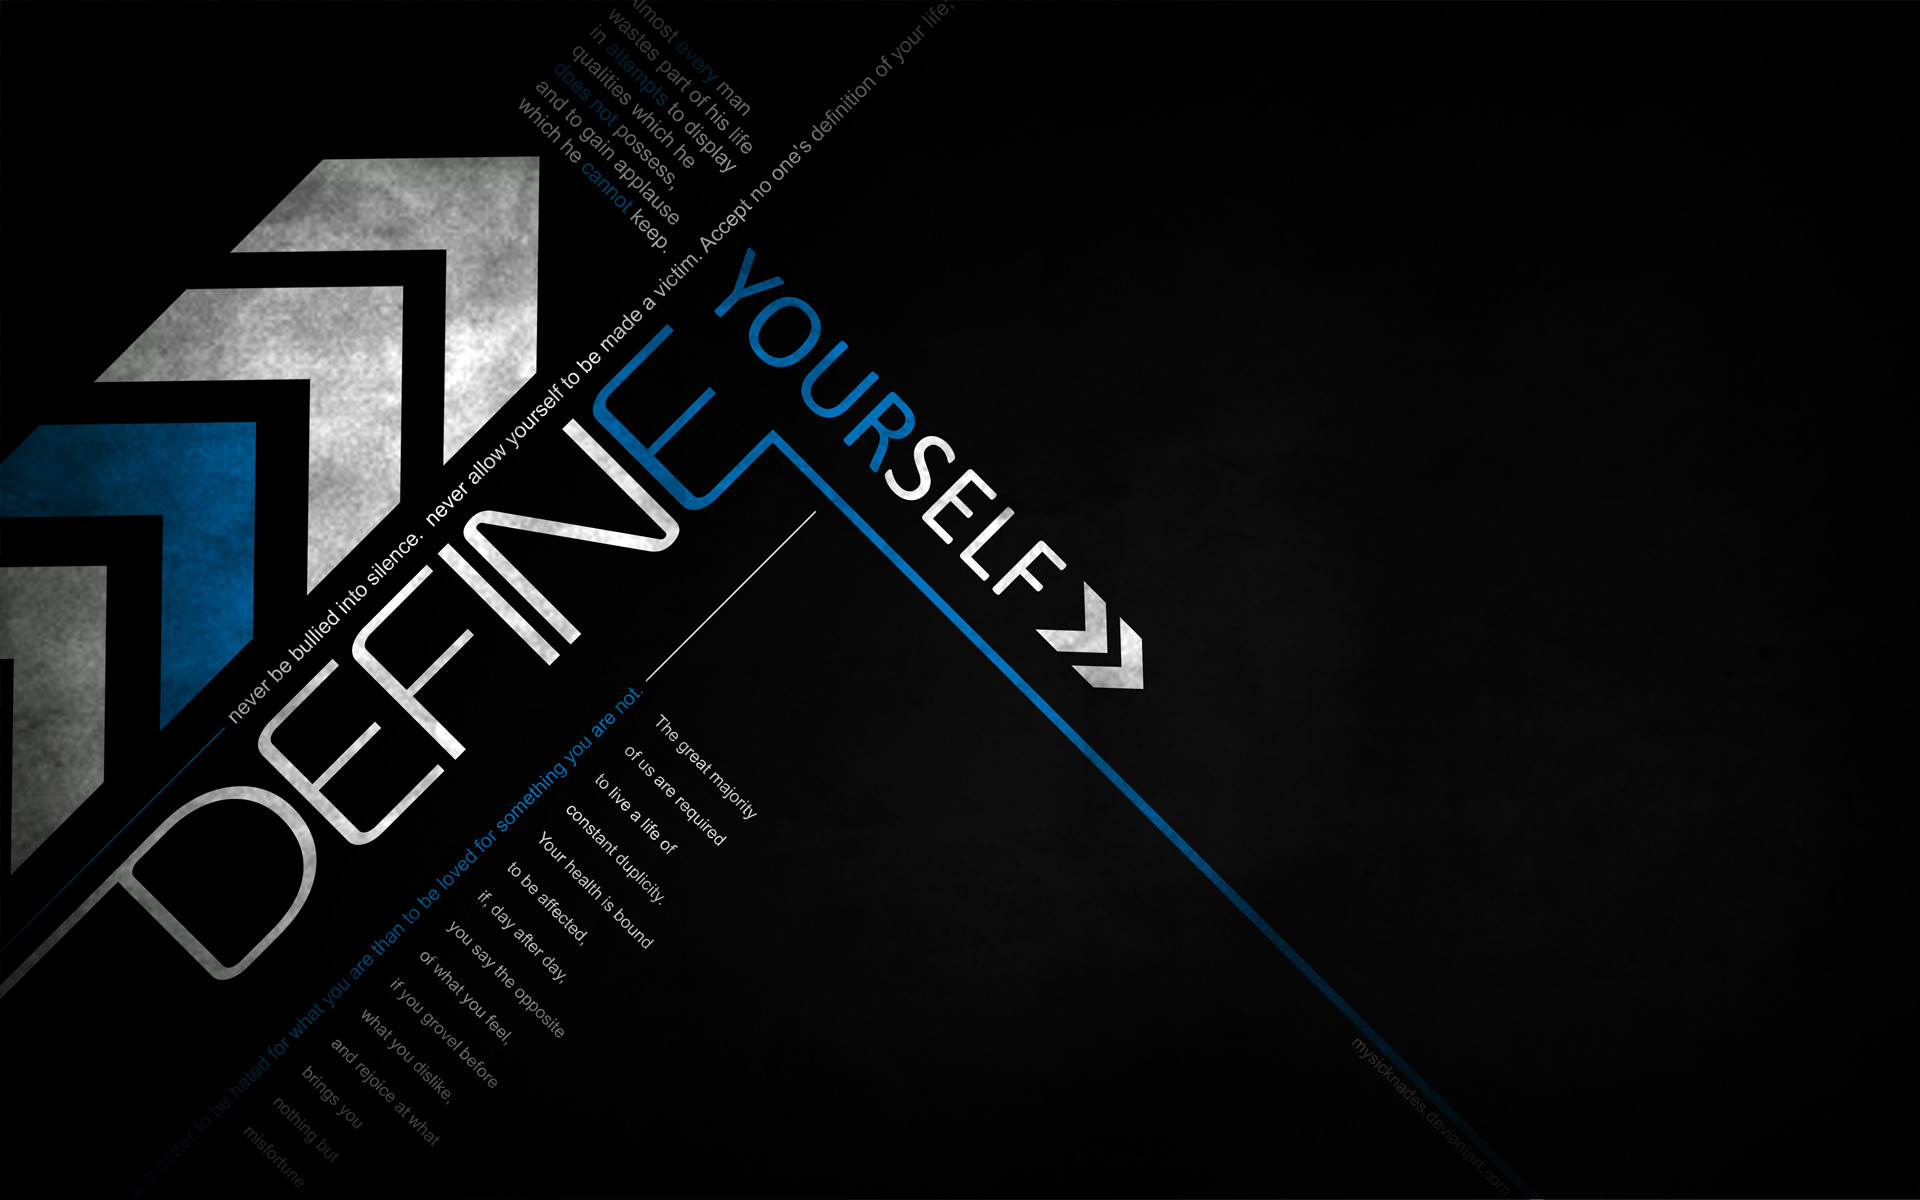 Success Quotes HD desktop wallpaper High Definition Fullscreen